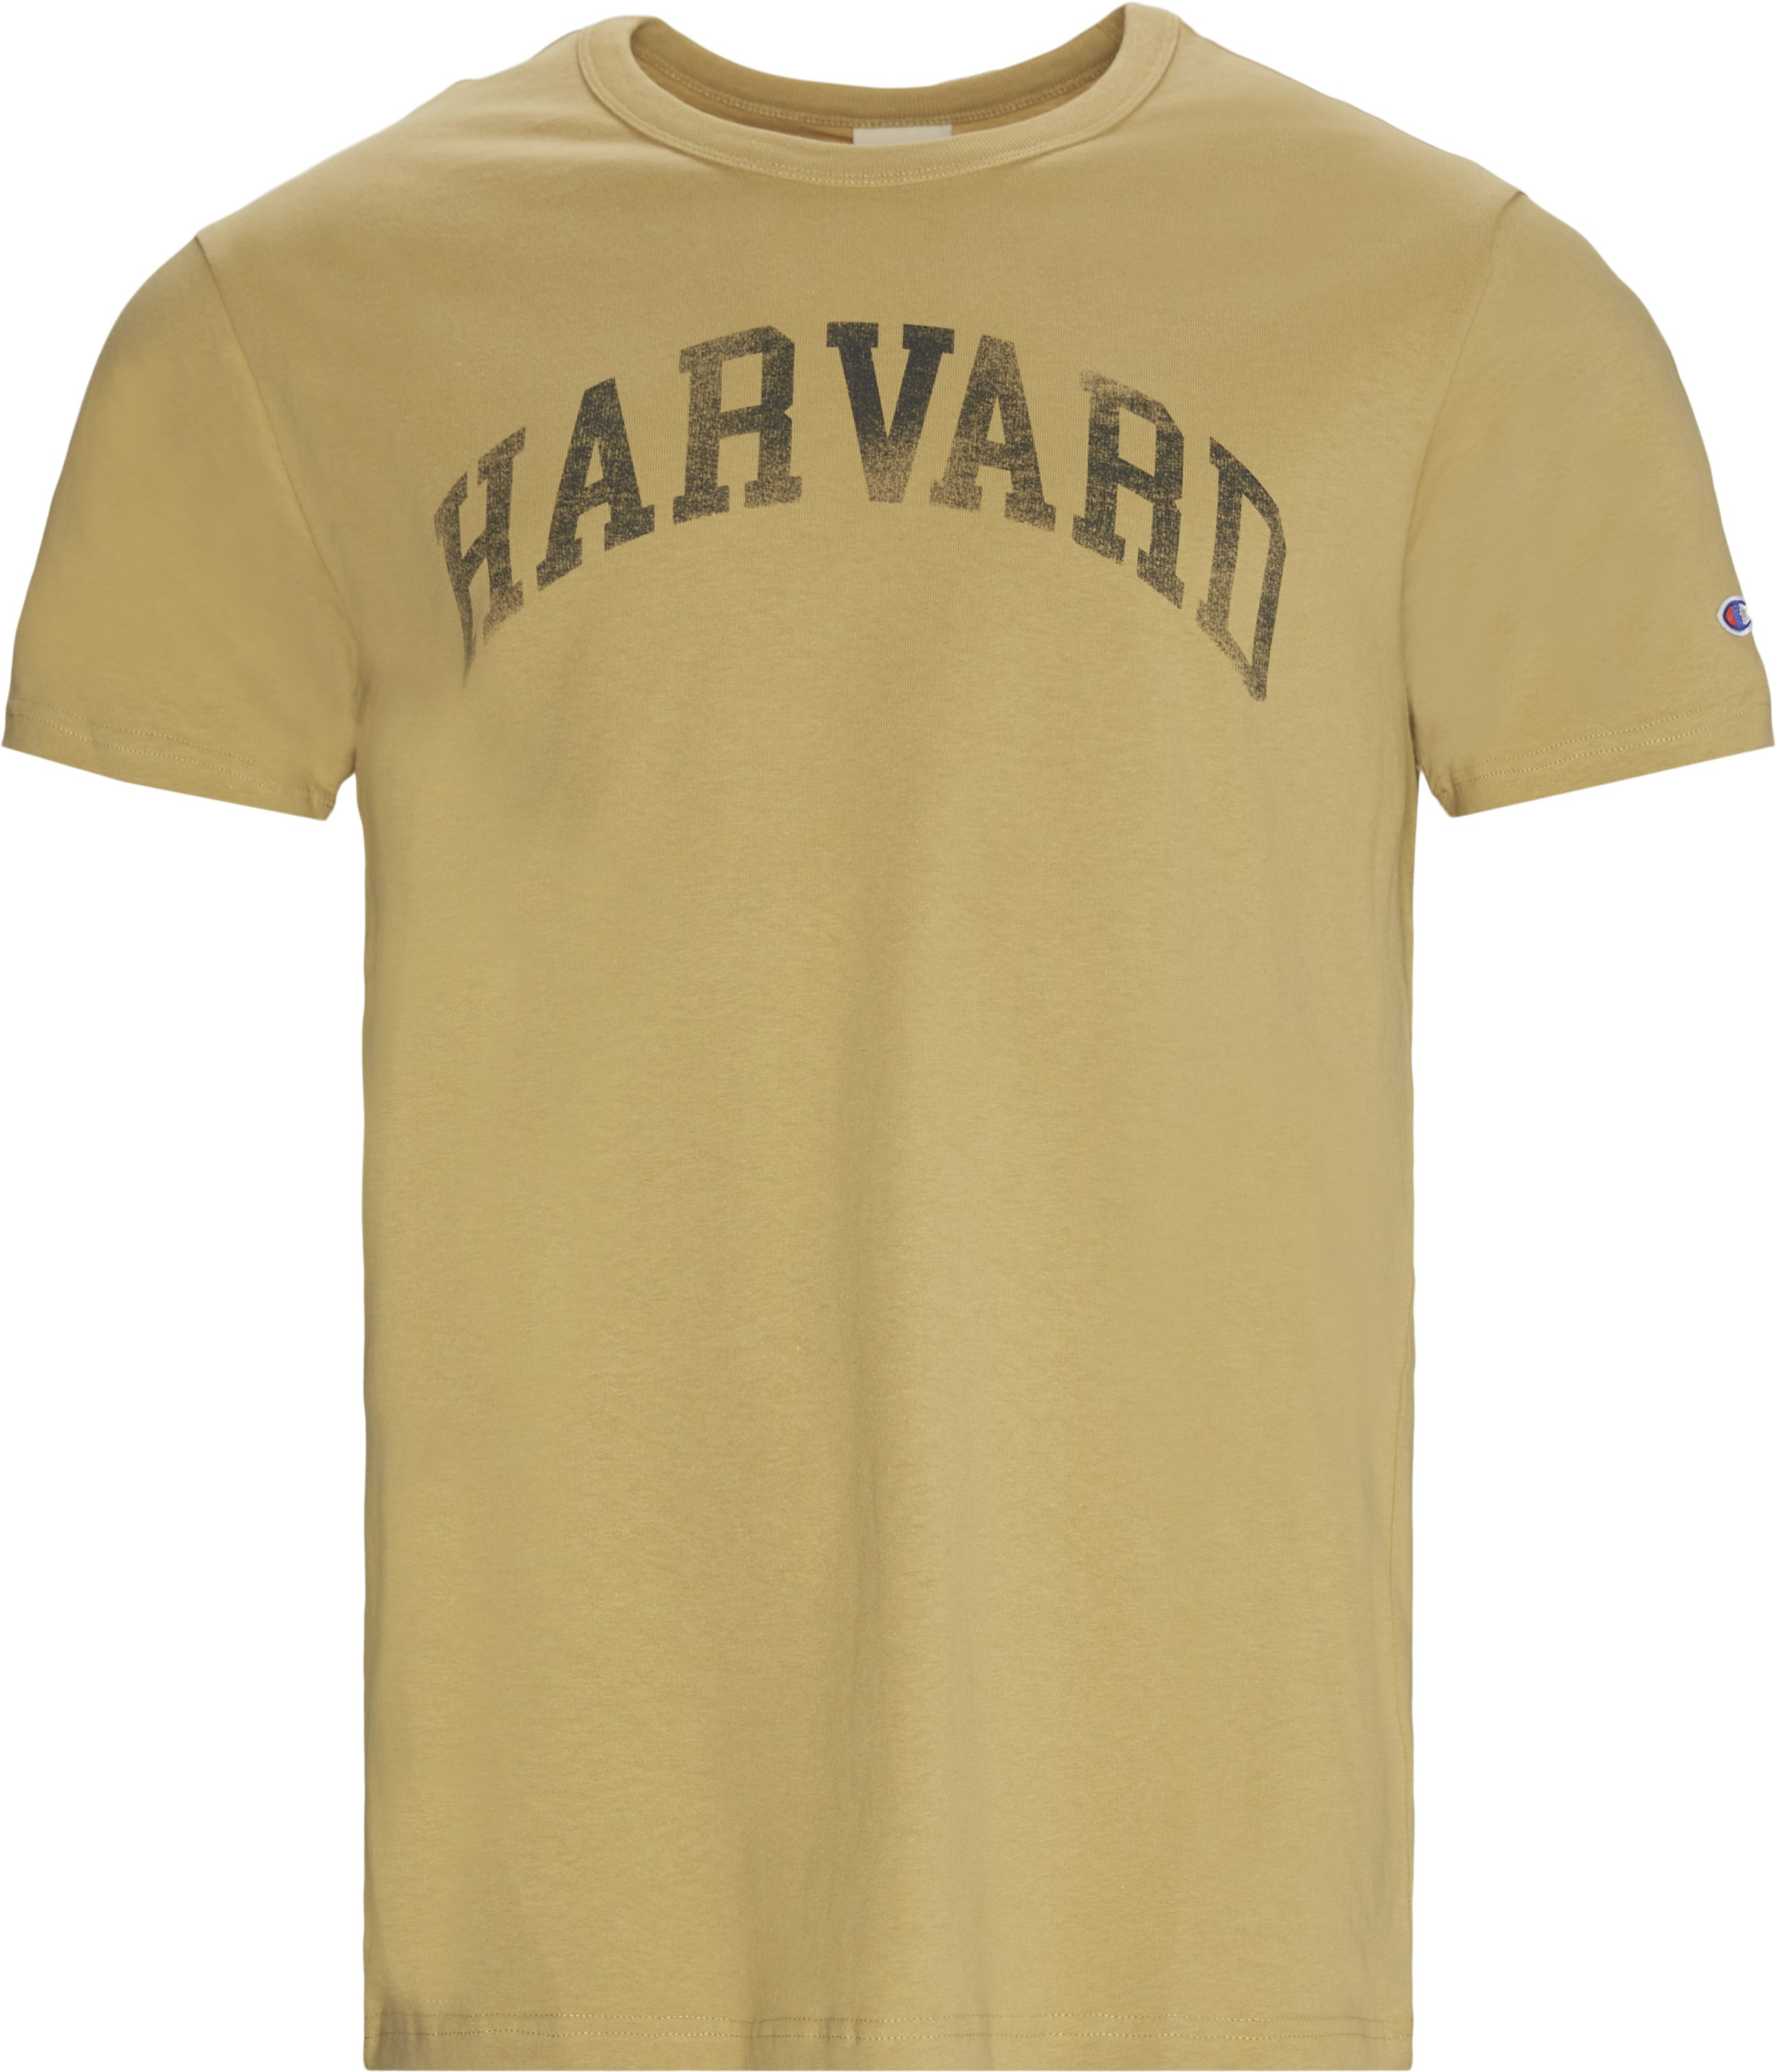 Harvard Tee - T-shirts - Regular fit - Sand